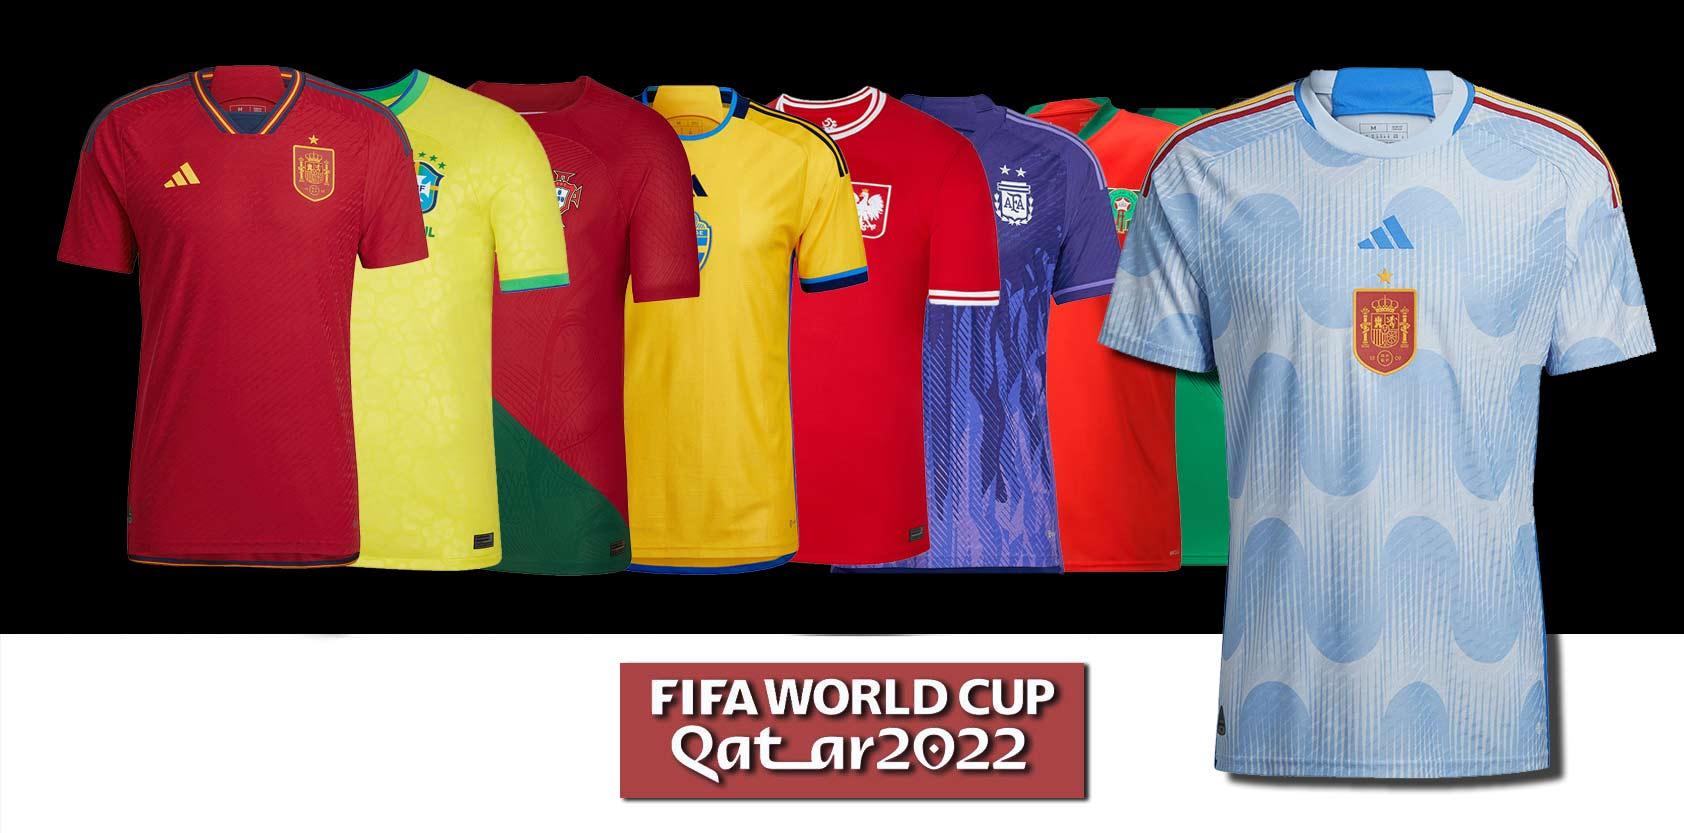 Comprar Camisetas de fútbol baratas en línea 78907a3bfbb0a